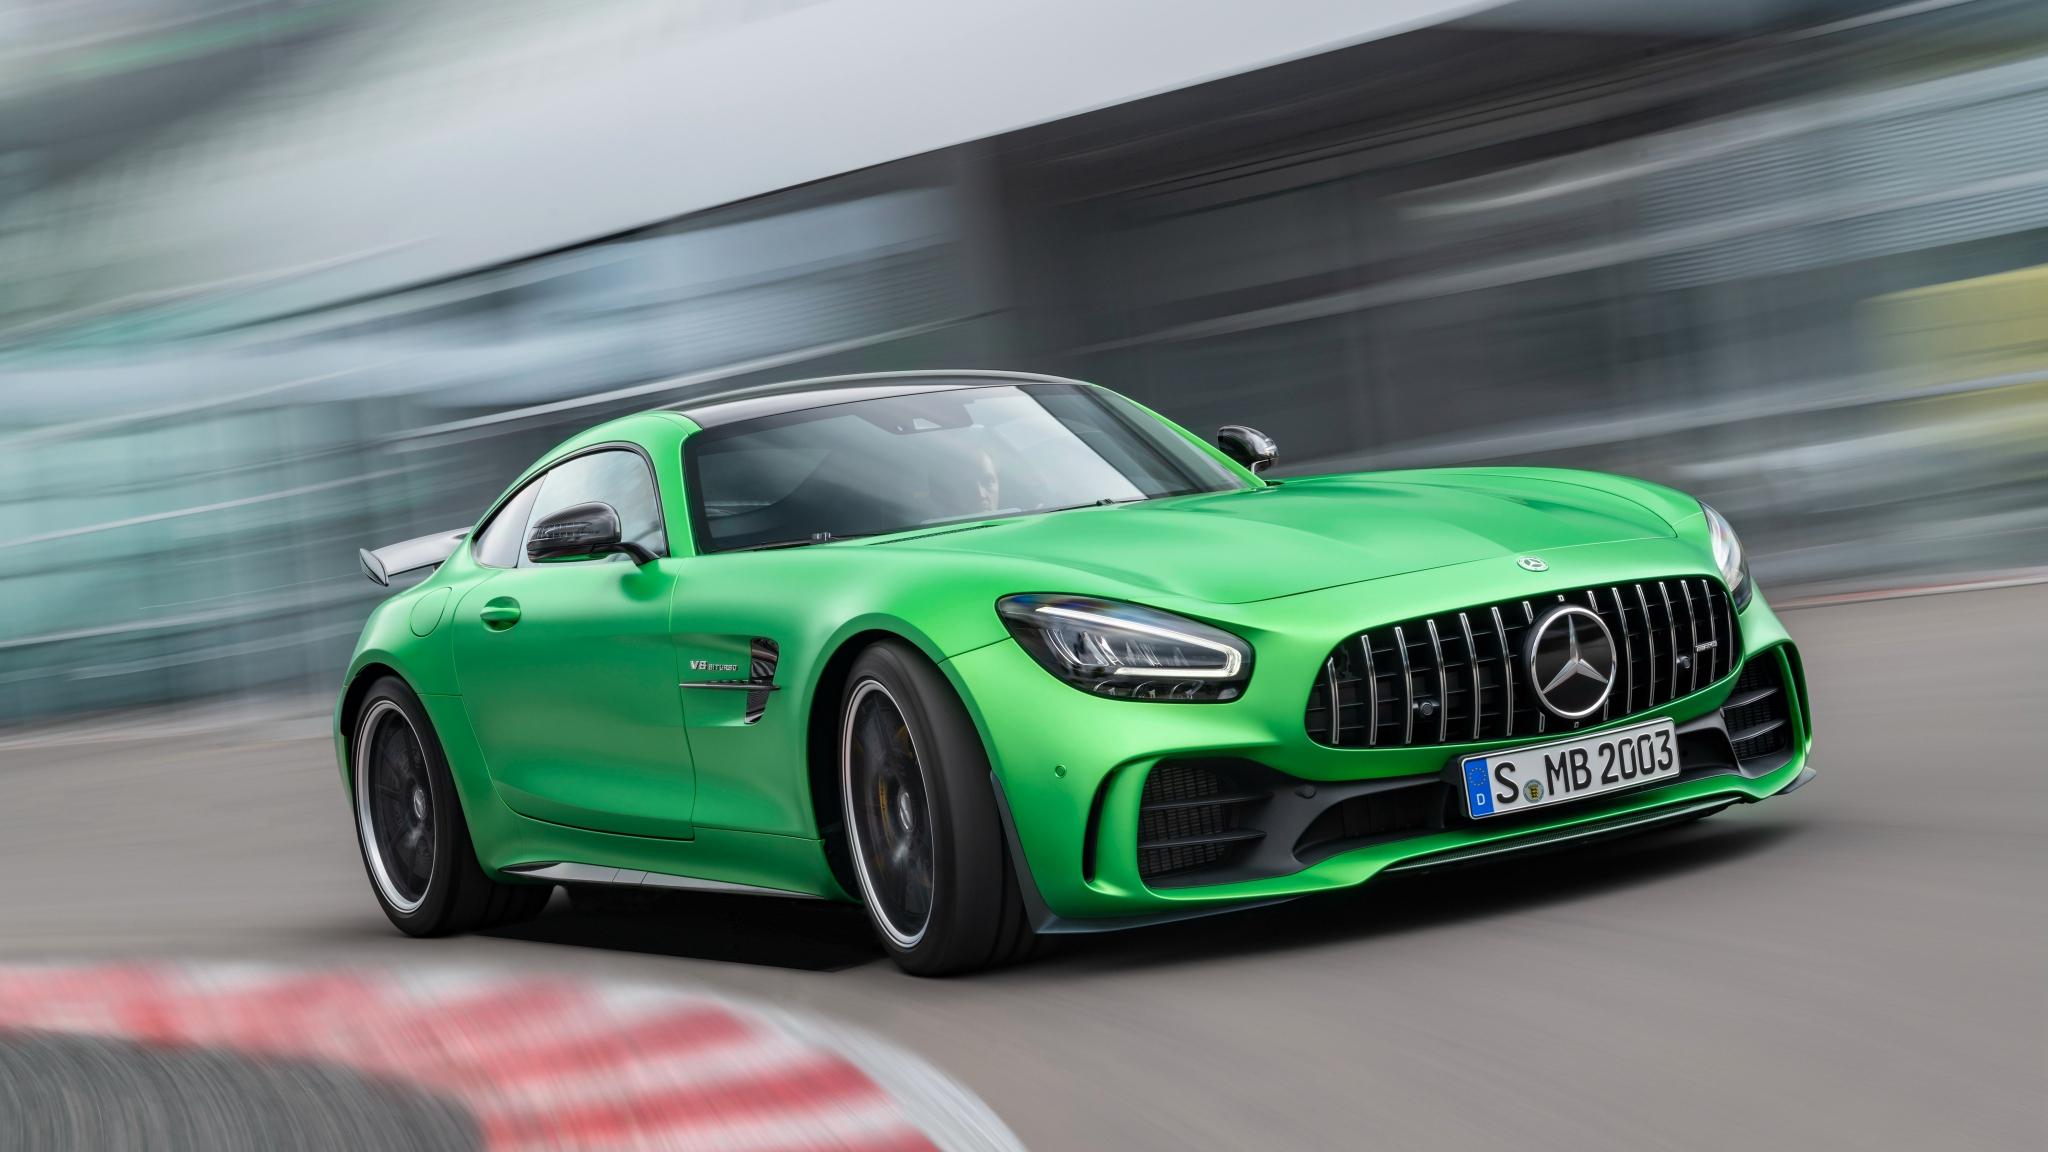 Mercedes-AMG GT, green car, on-road, 2048x1152 wallpaper